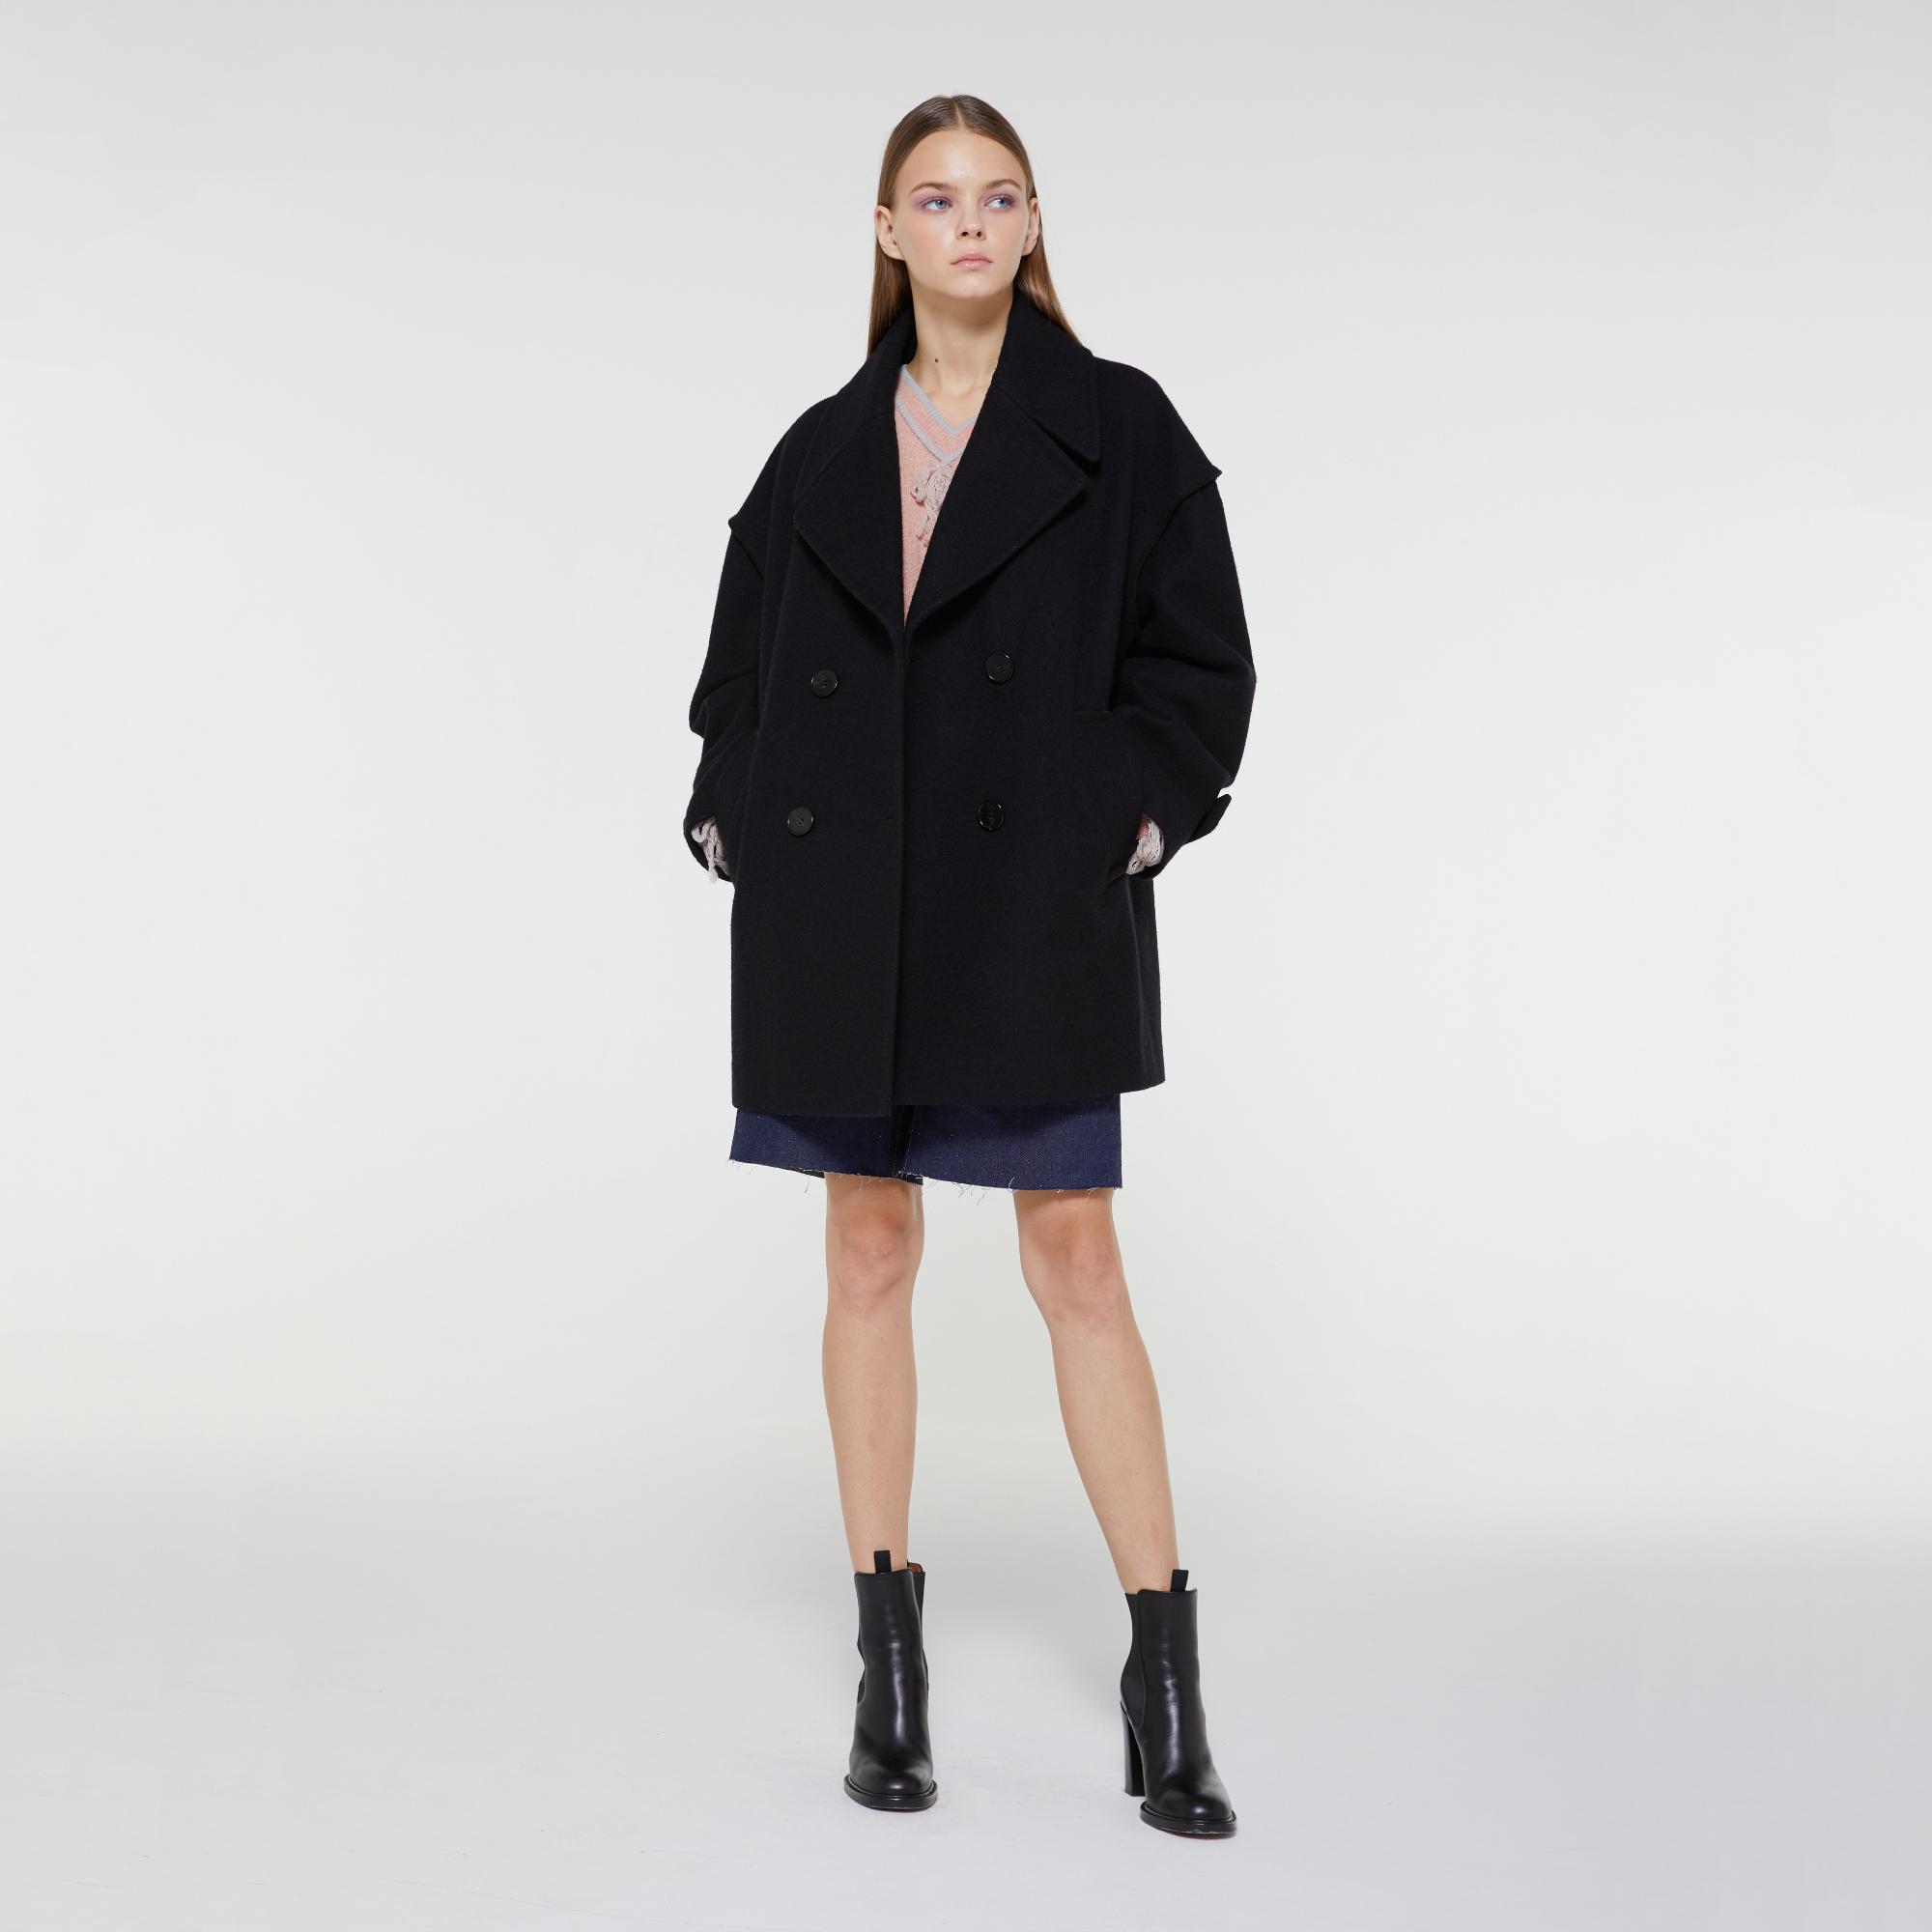 YOONA Oversized Double Breasted Coat BLACK w/ Marton Mills